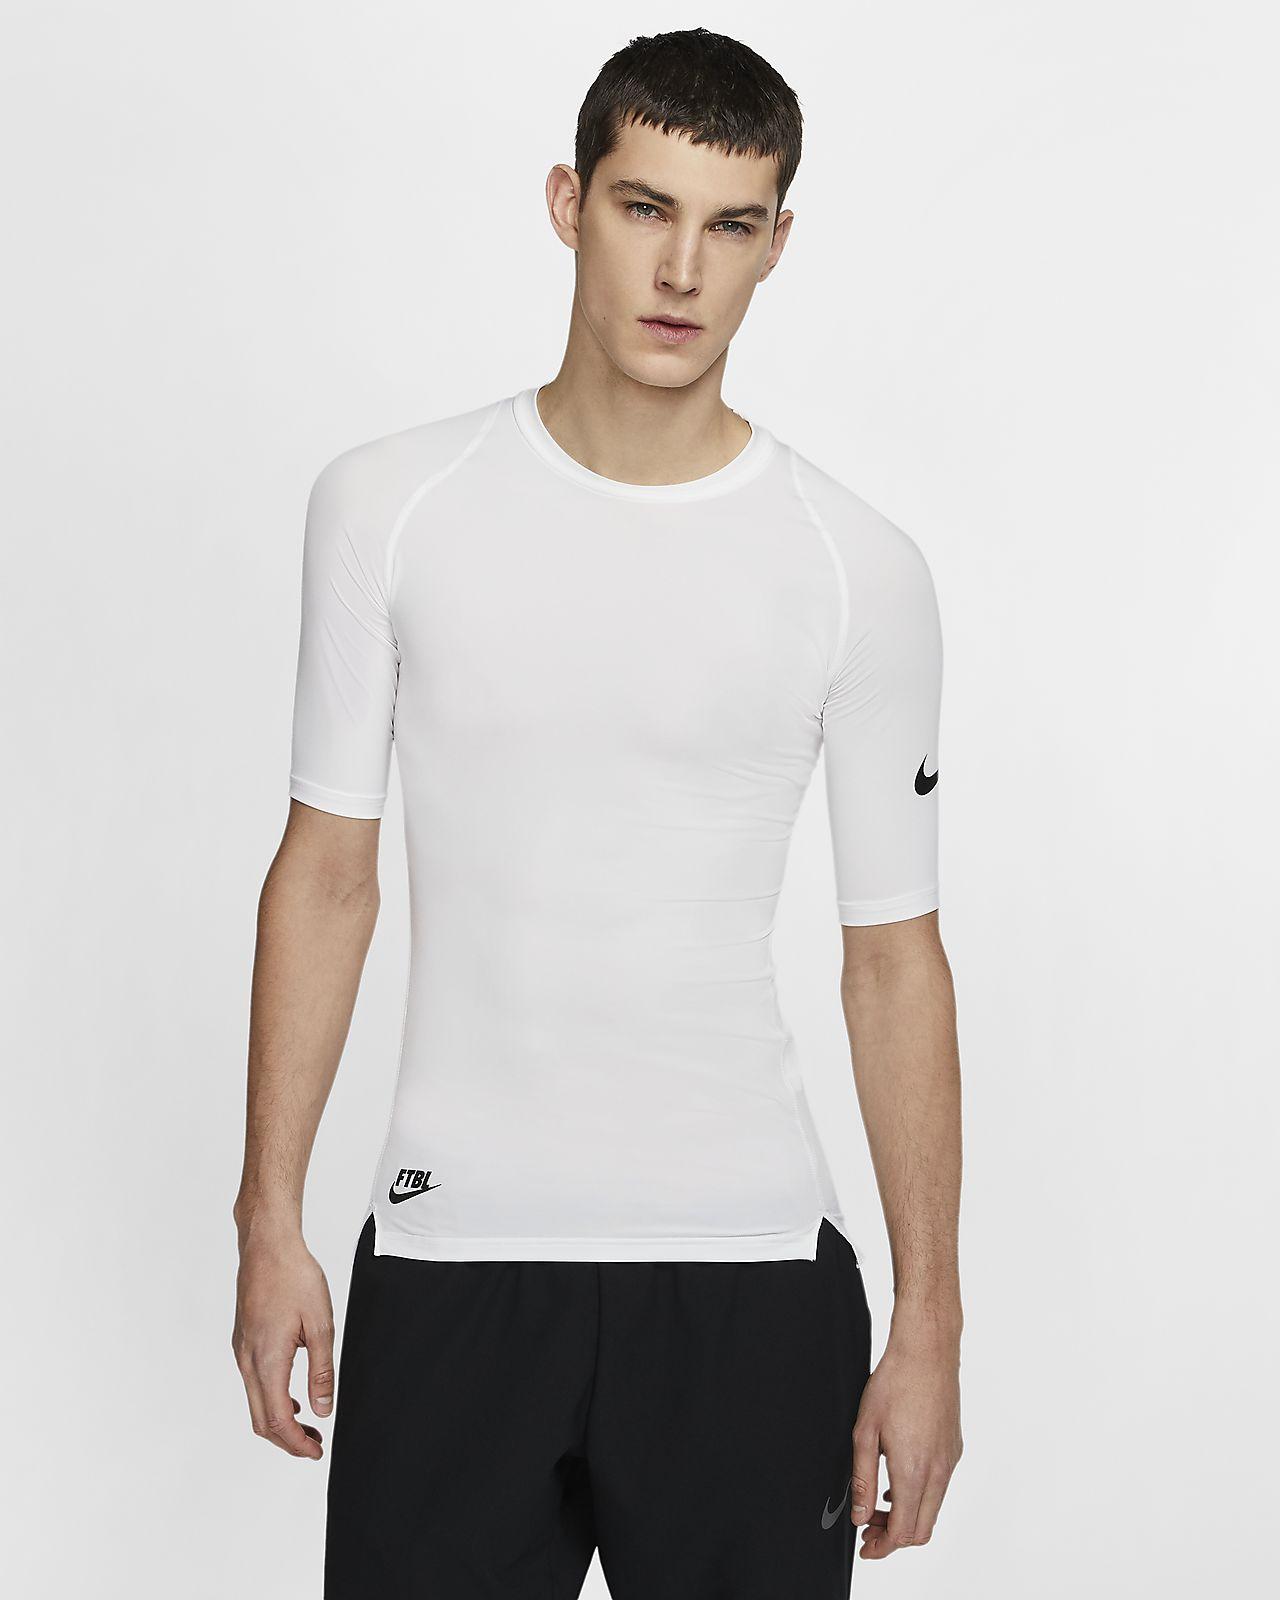 Prenda para la parte superior de media manga para hombre Nike Pro